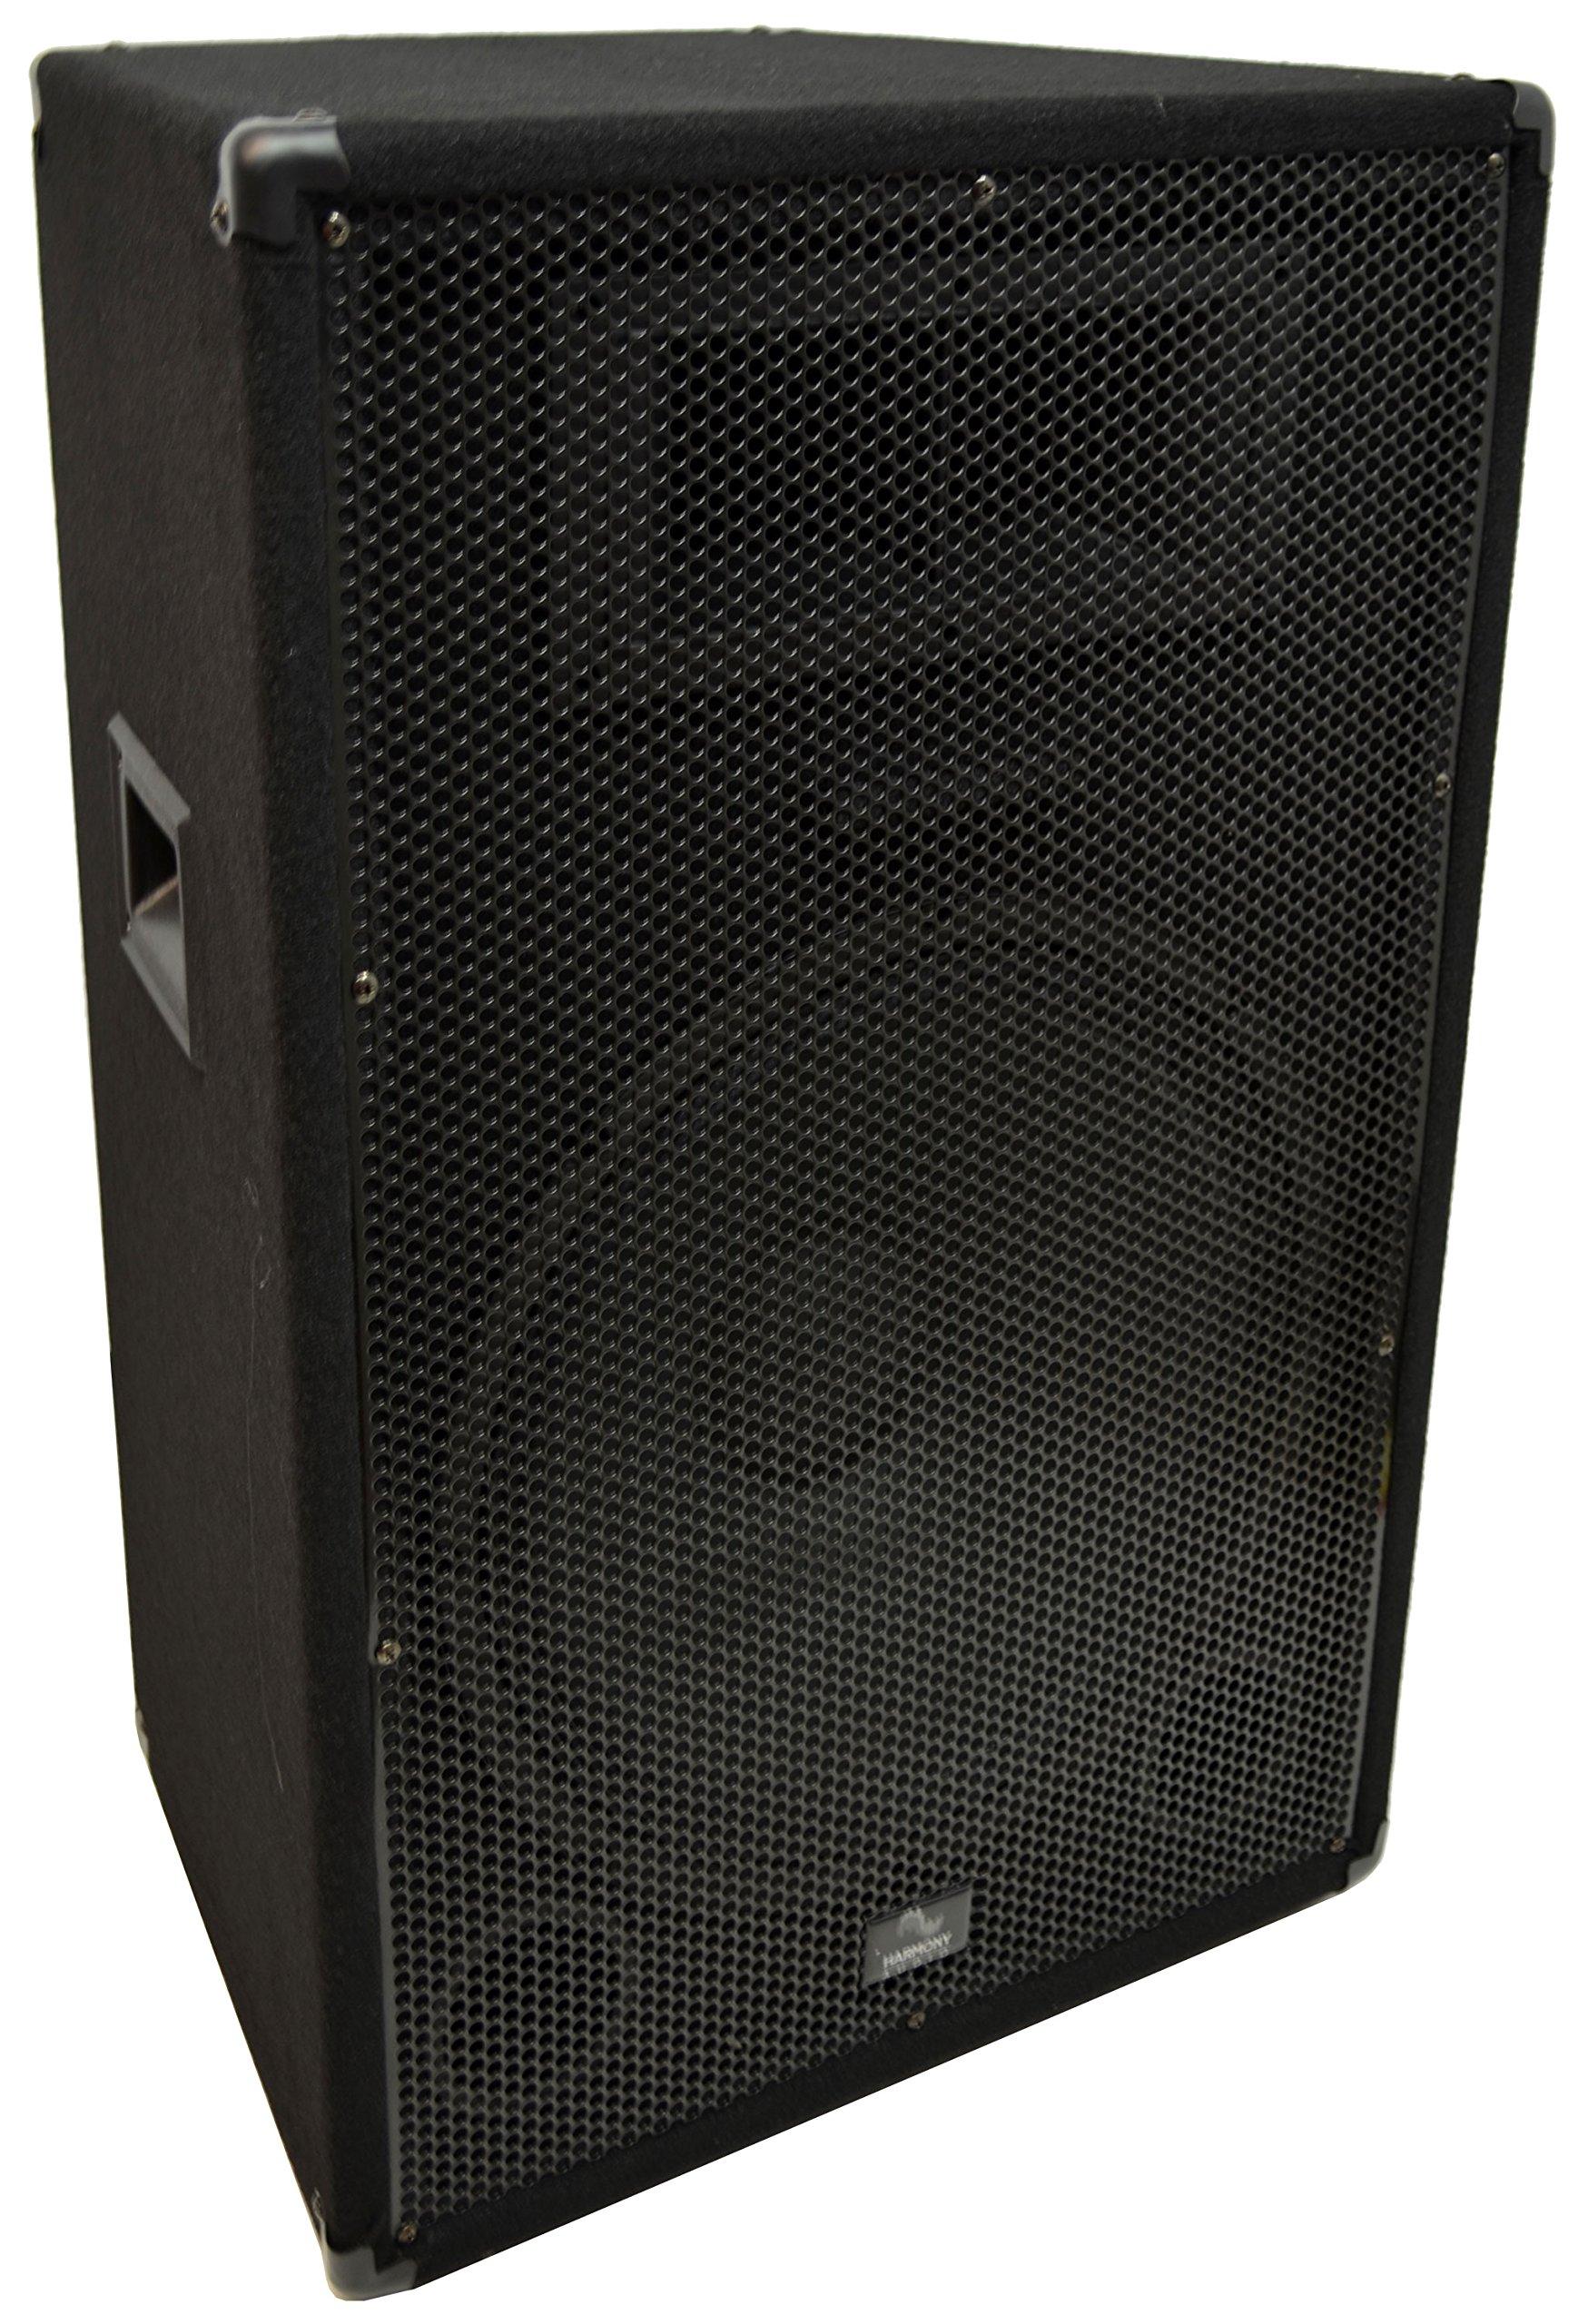 Harmony Audio HA-V15P Pro DJ Venue Series 15'' Passive 900W PA Speaker 2-Way Cabinet